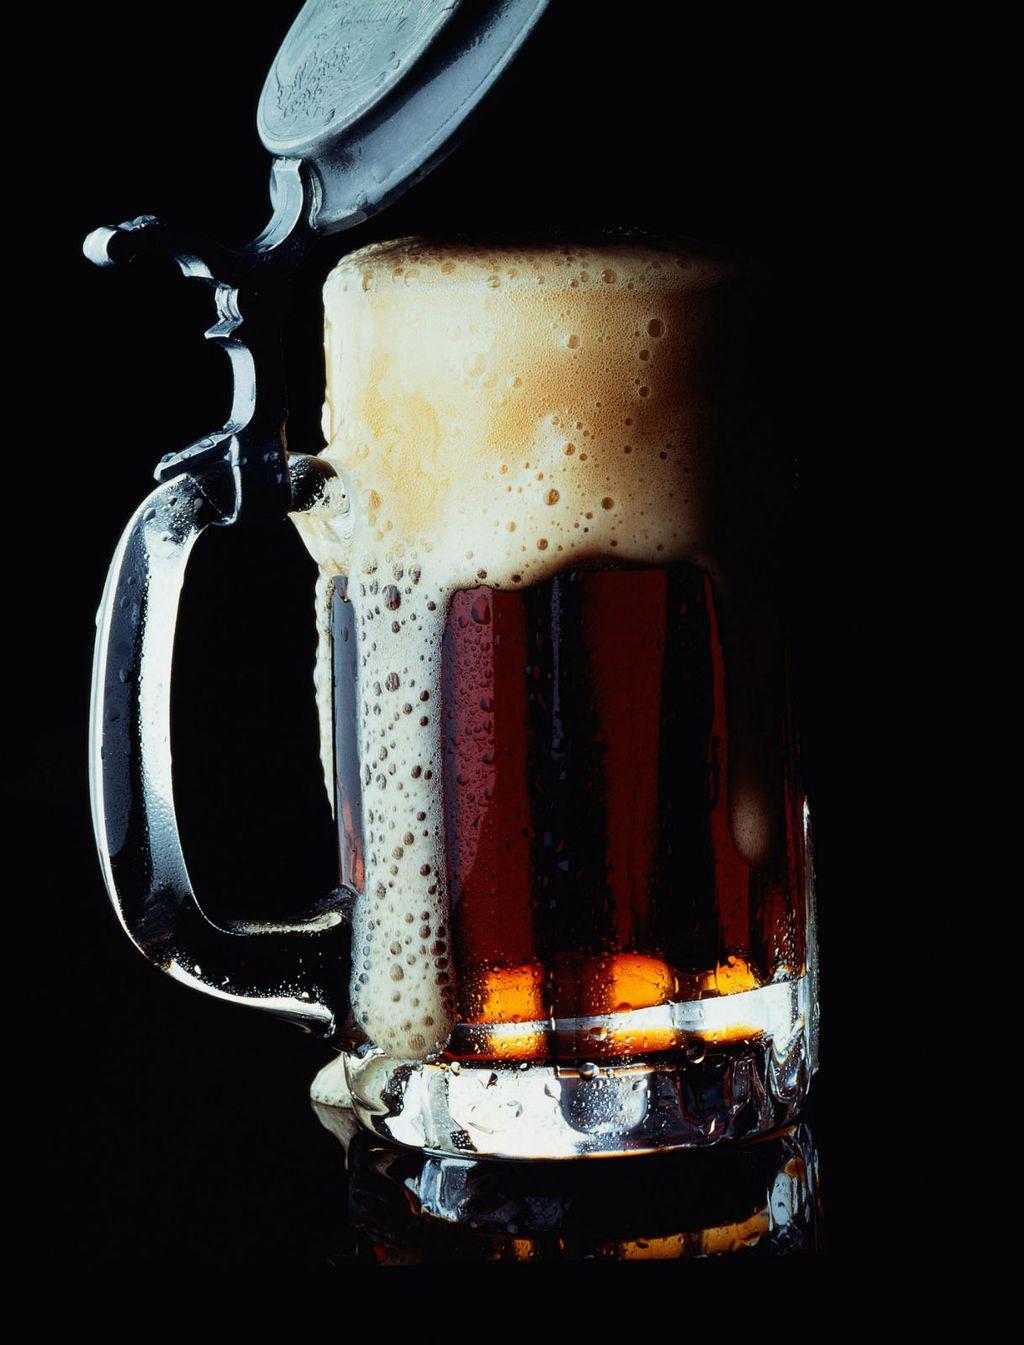 Pivo ima dosta šećera